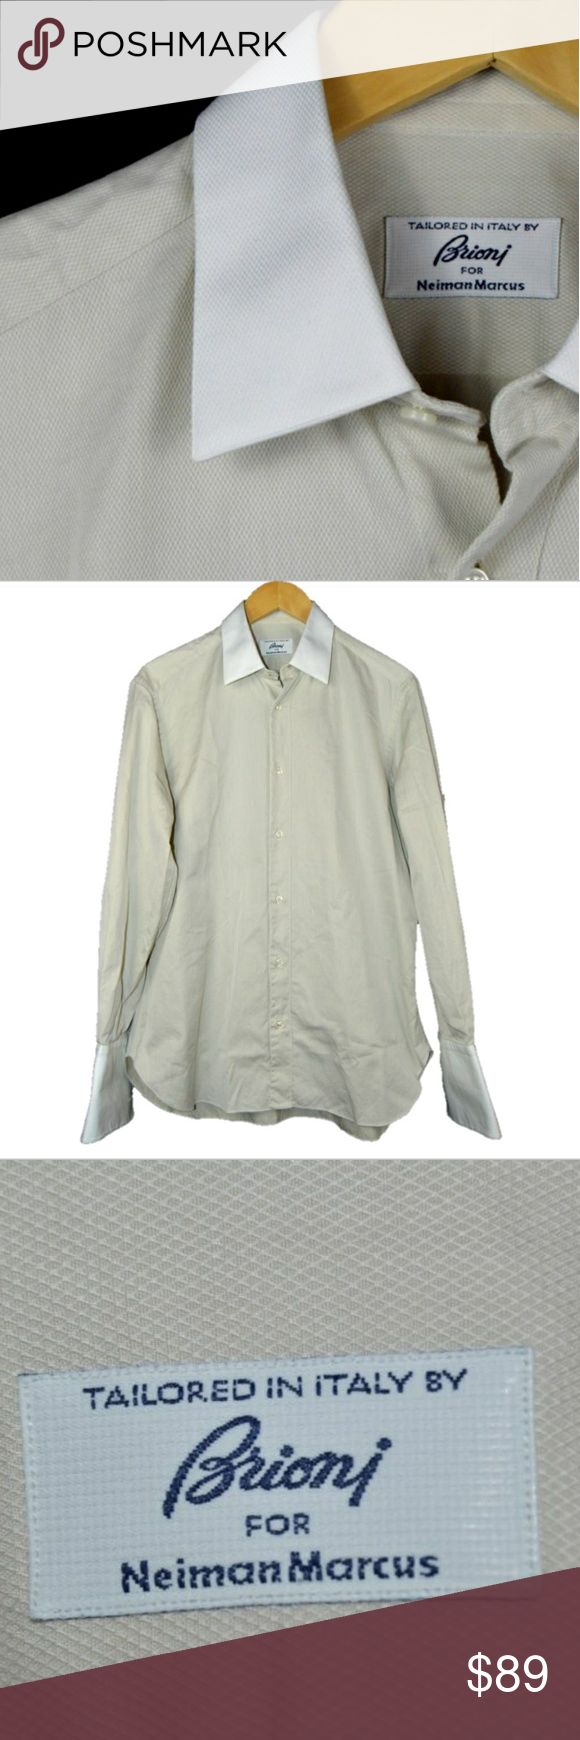 Brioni French cuff dress shirt beige w. white Brioni French cuff dress shirt beige w. white collar 15R Brioni Shirts Dress Shirts